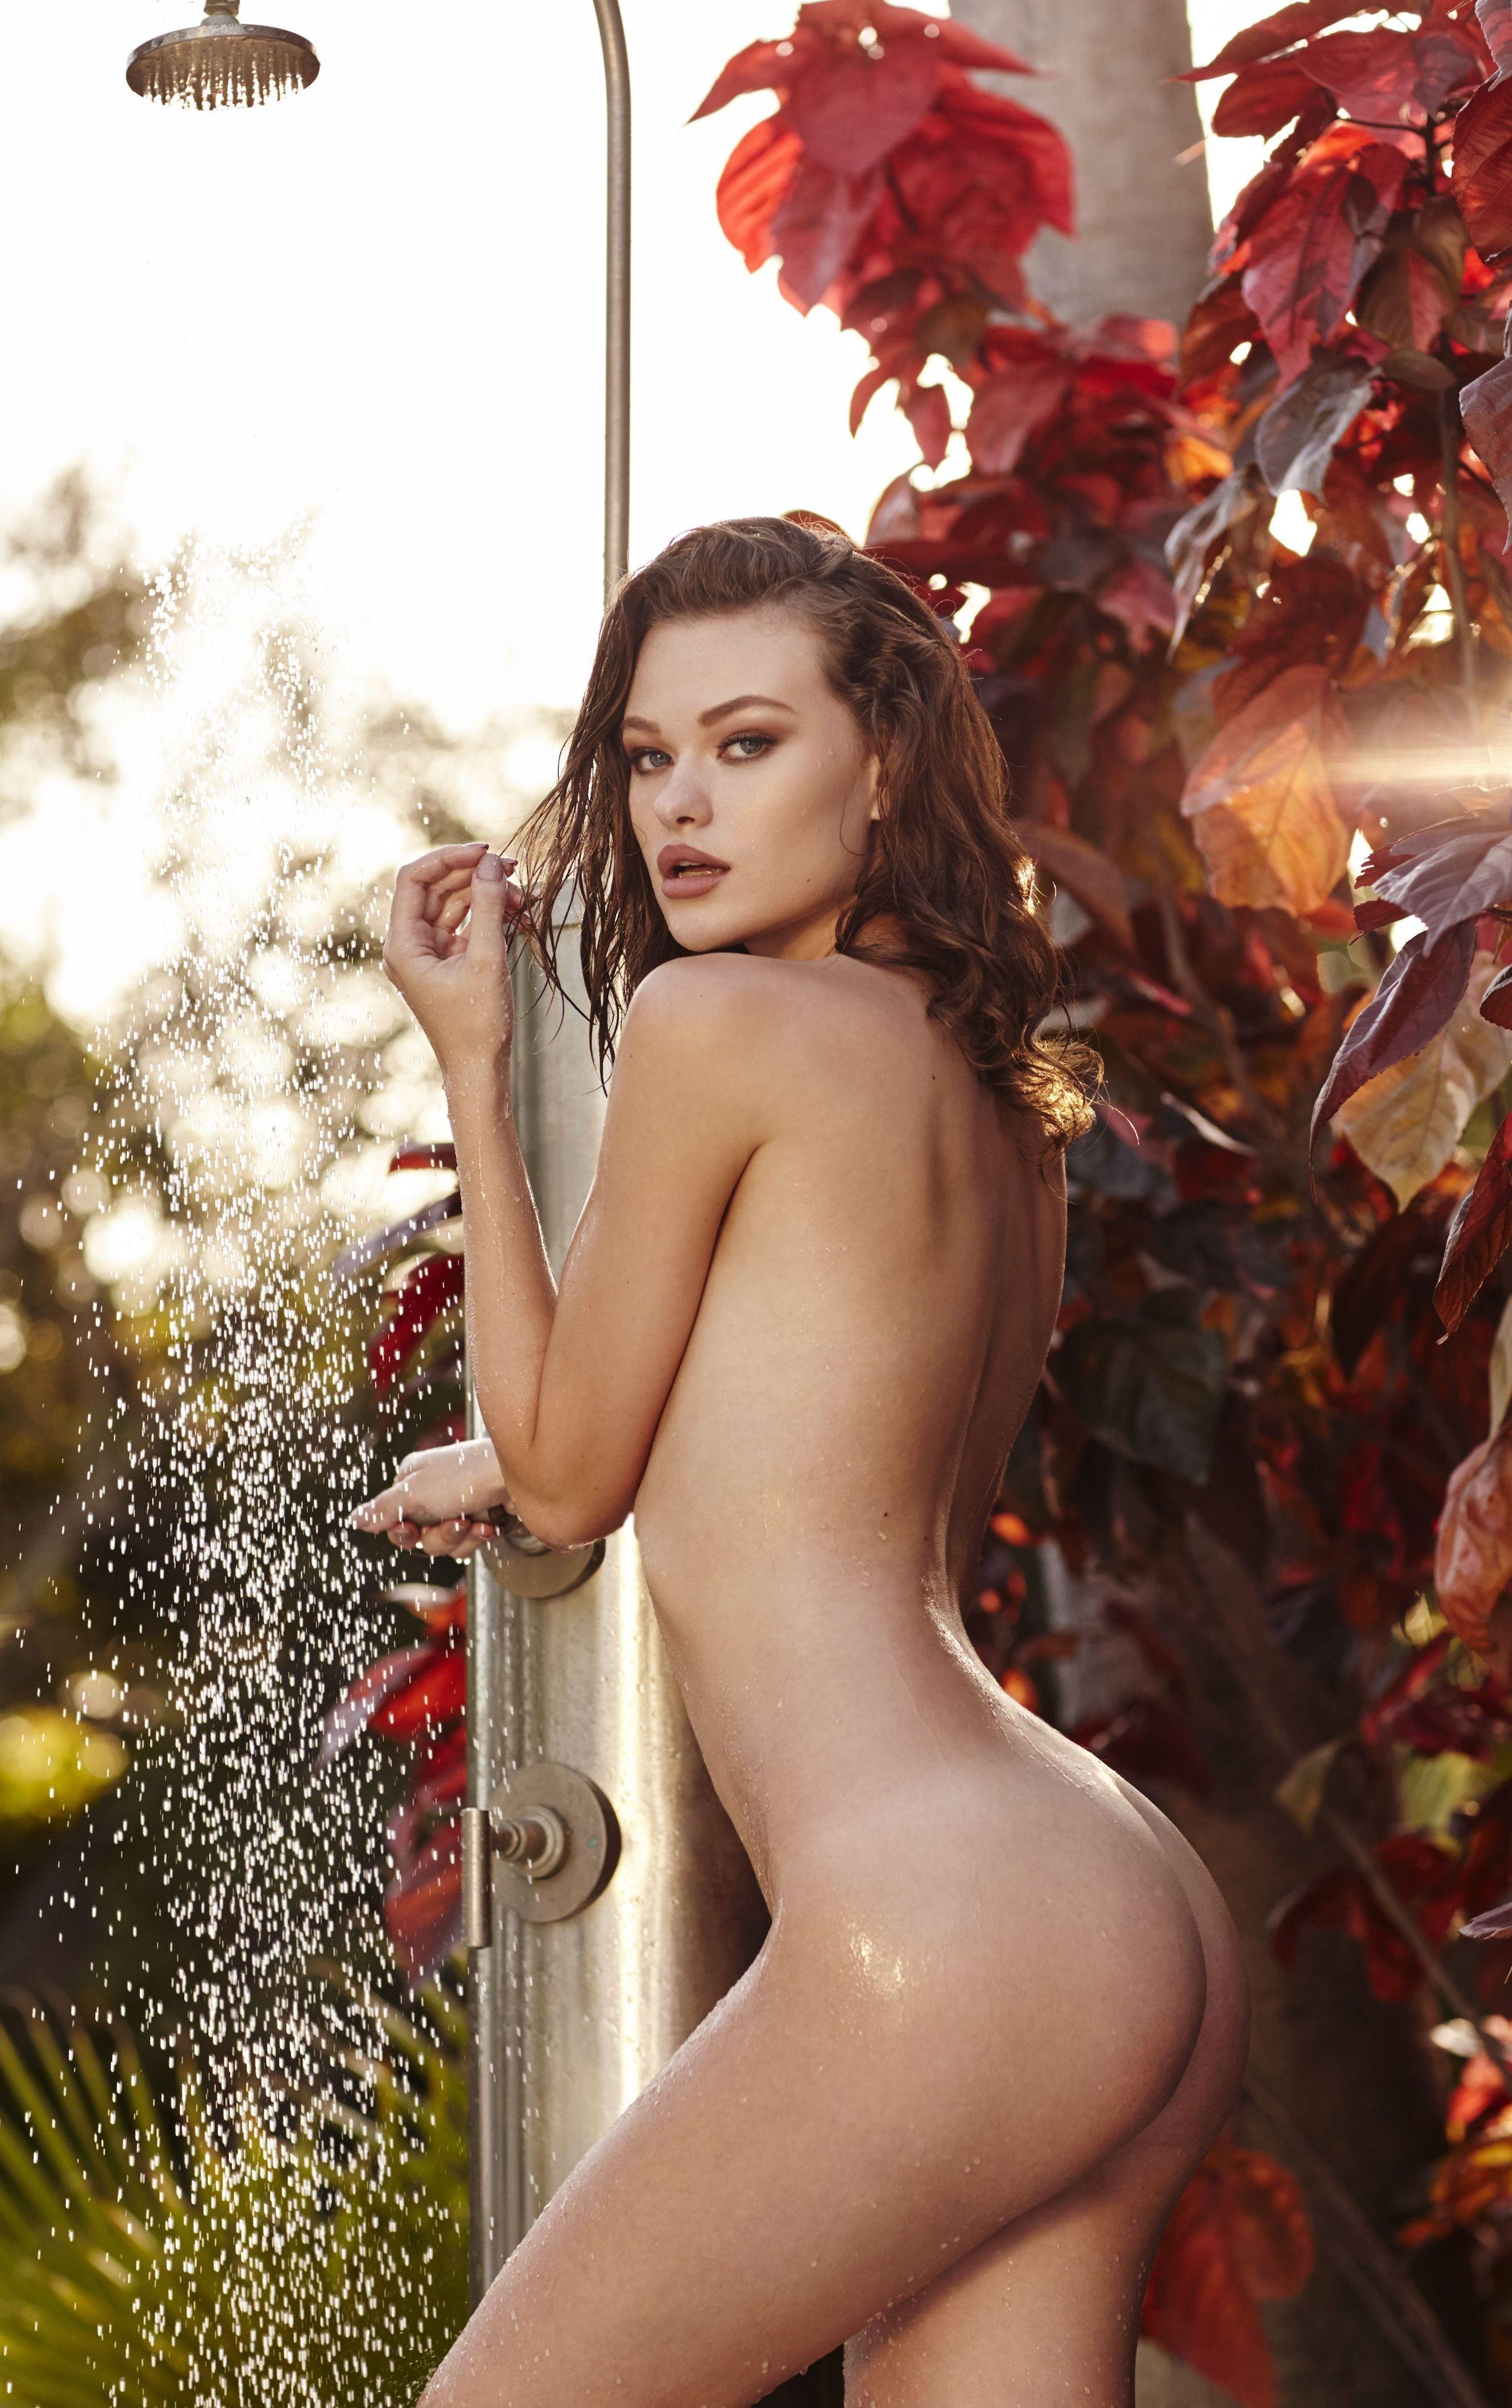 Lily rose cameron nude 7 Photos naked (79 photo), Paparazzi Celebrites photos